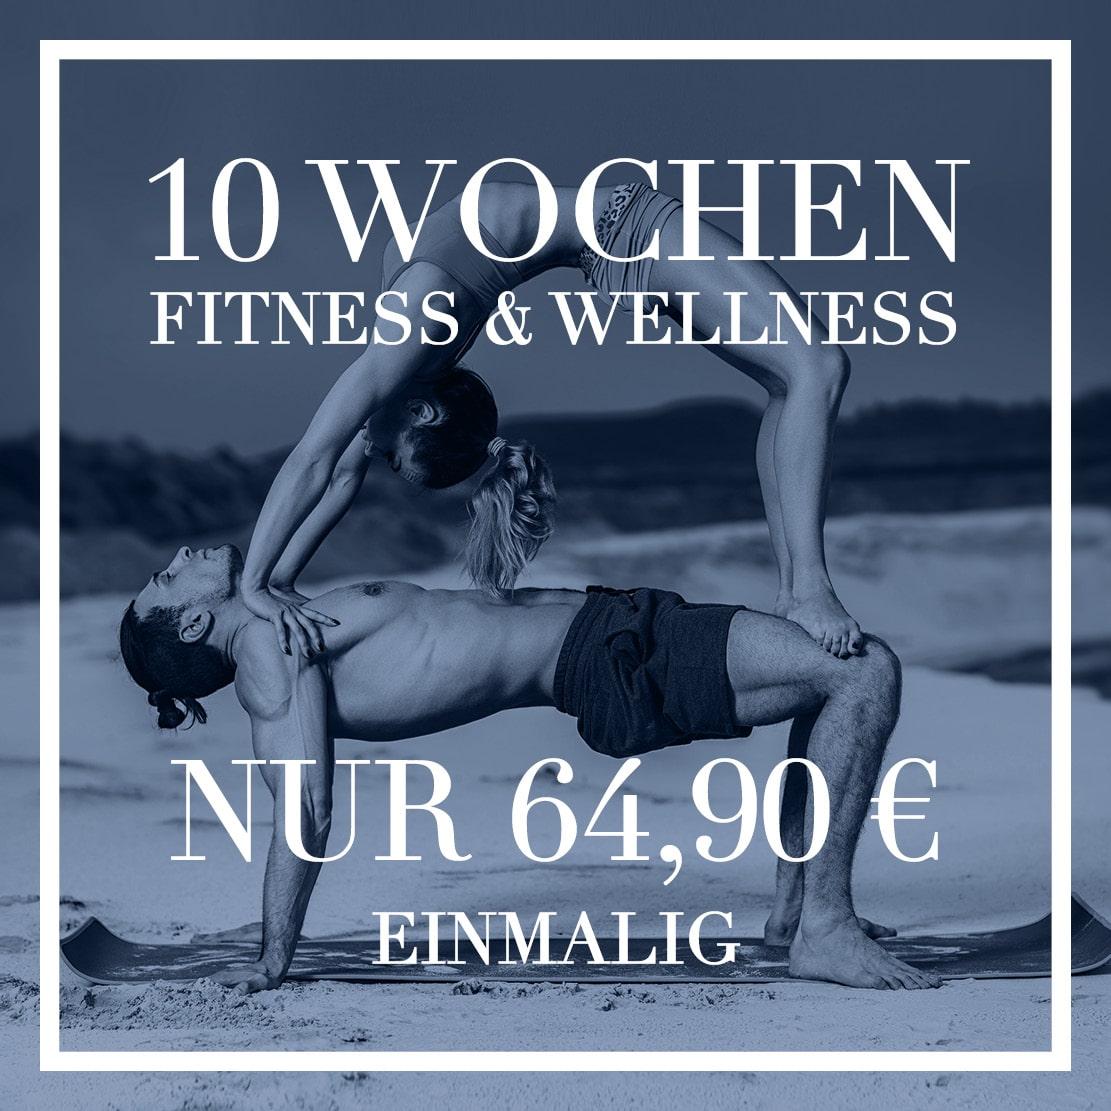 10 wochen fitness wellness pure fitnessclub fitnessstudio in ludwigsburg. Black Bedroom Furniture Sets. Home Design Ideas